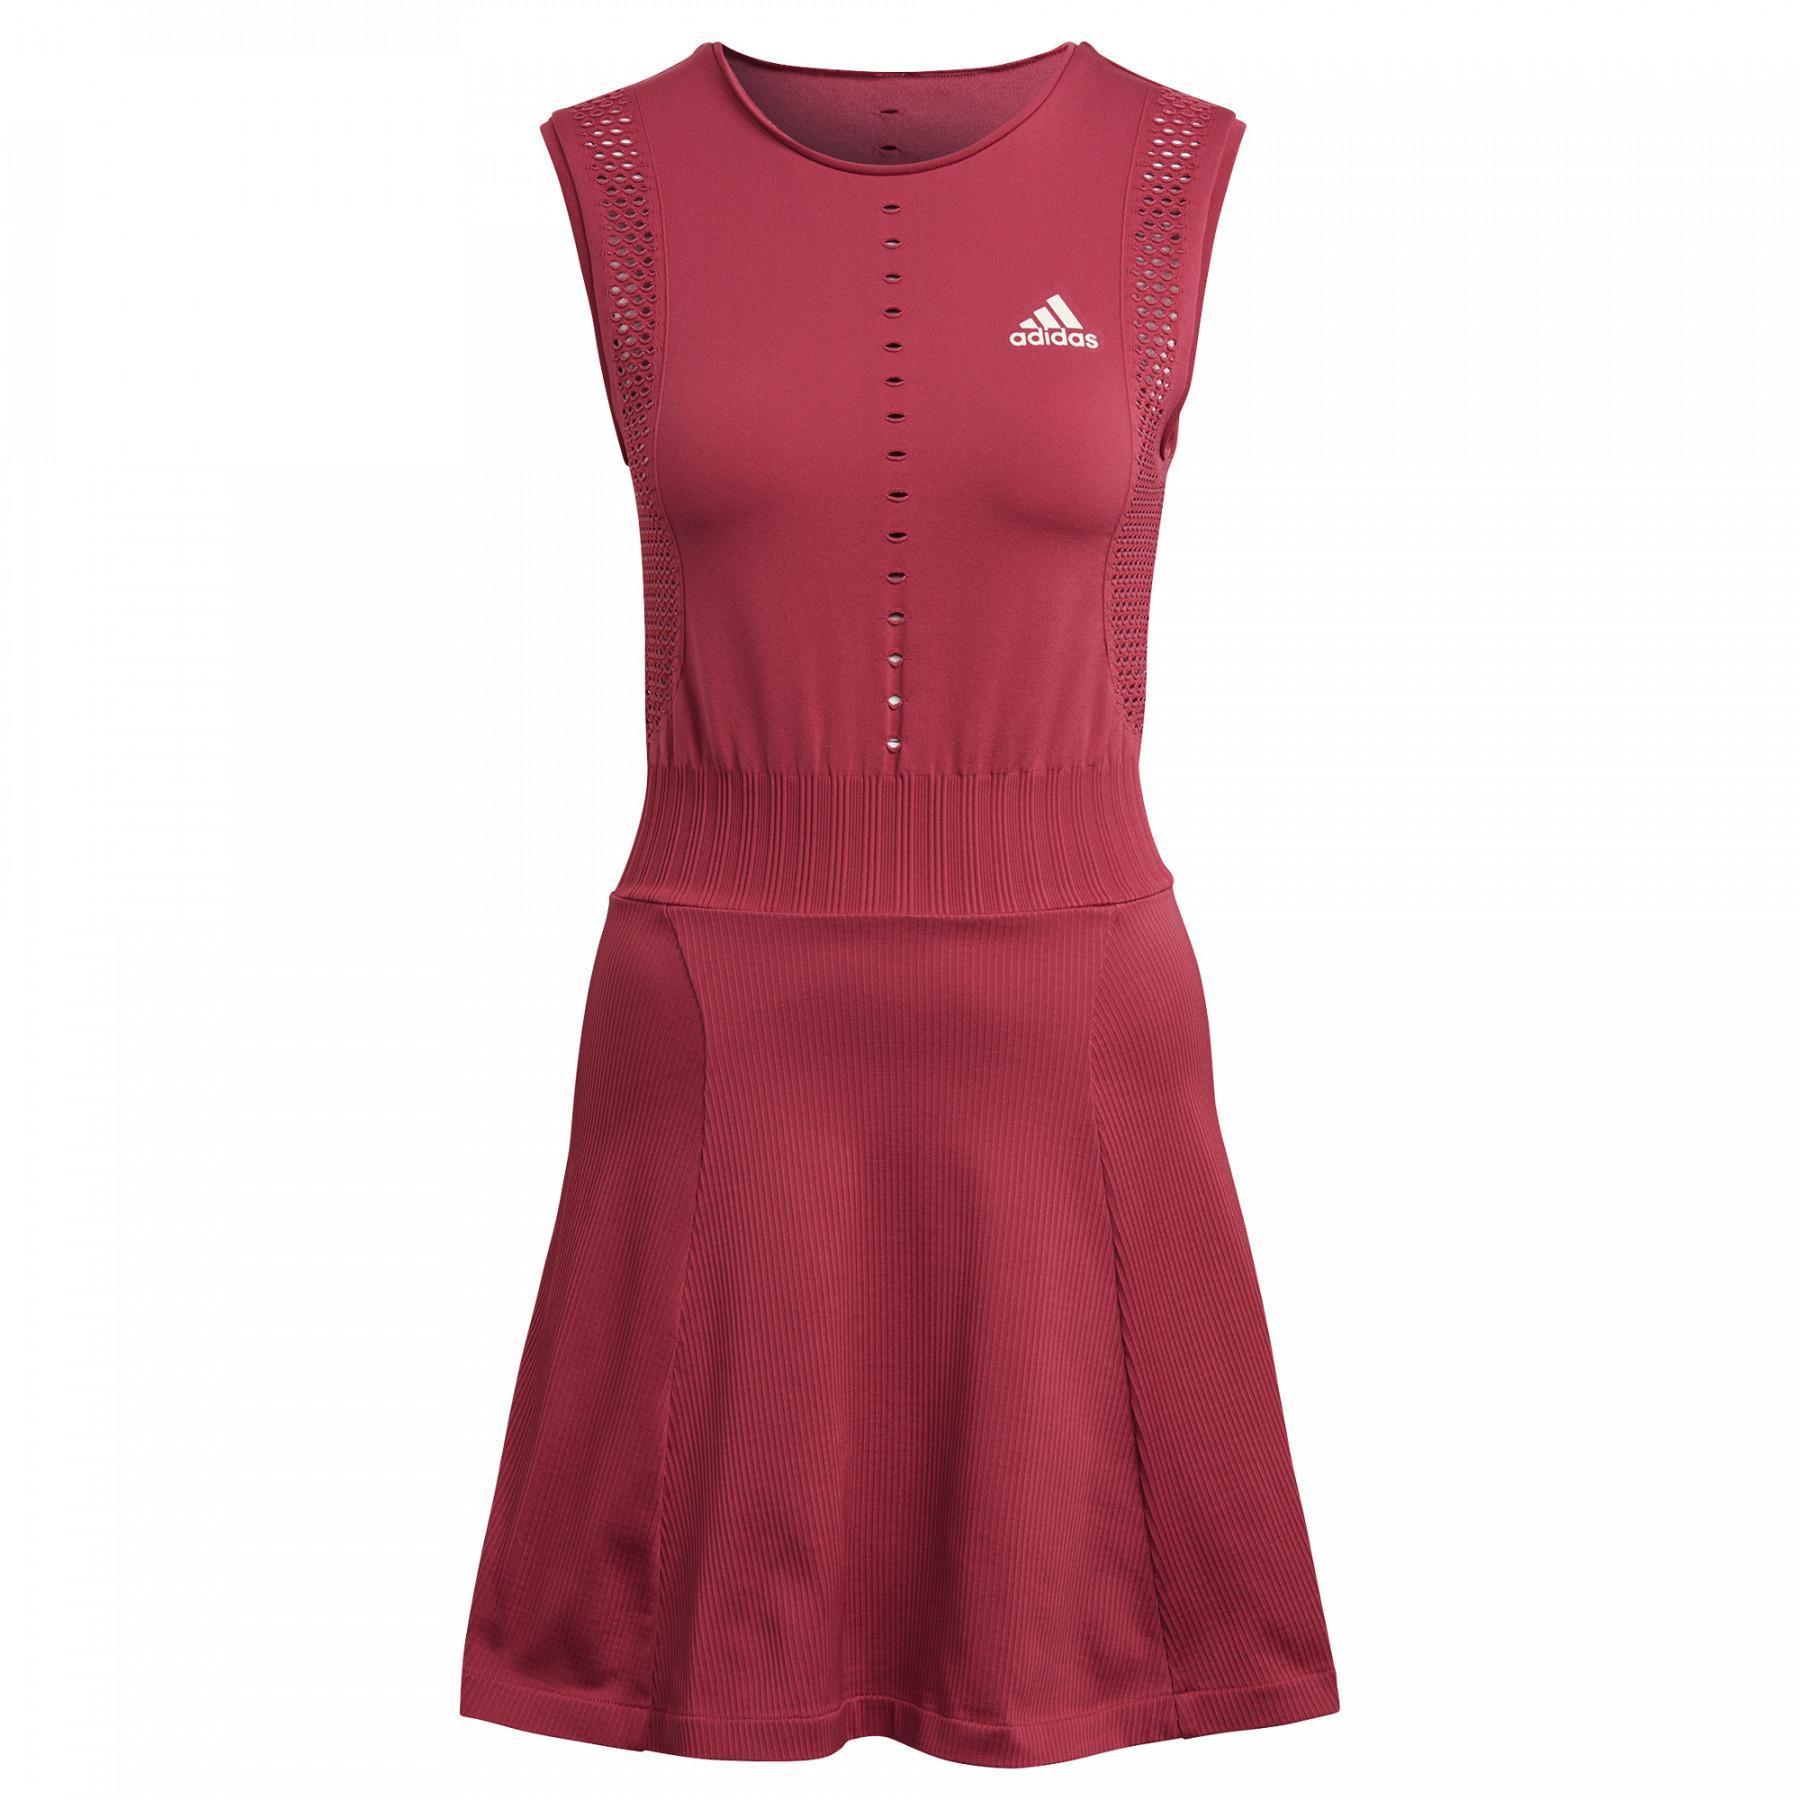 adidas Tennis Primeknit Primeblue Women's Skirt